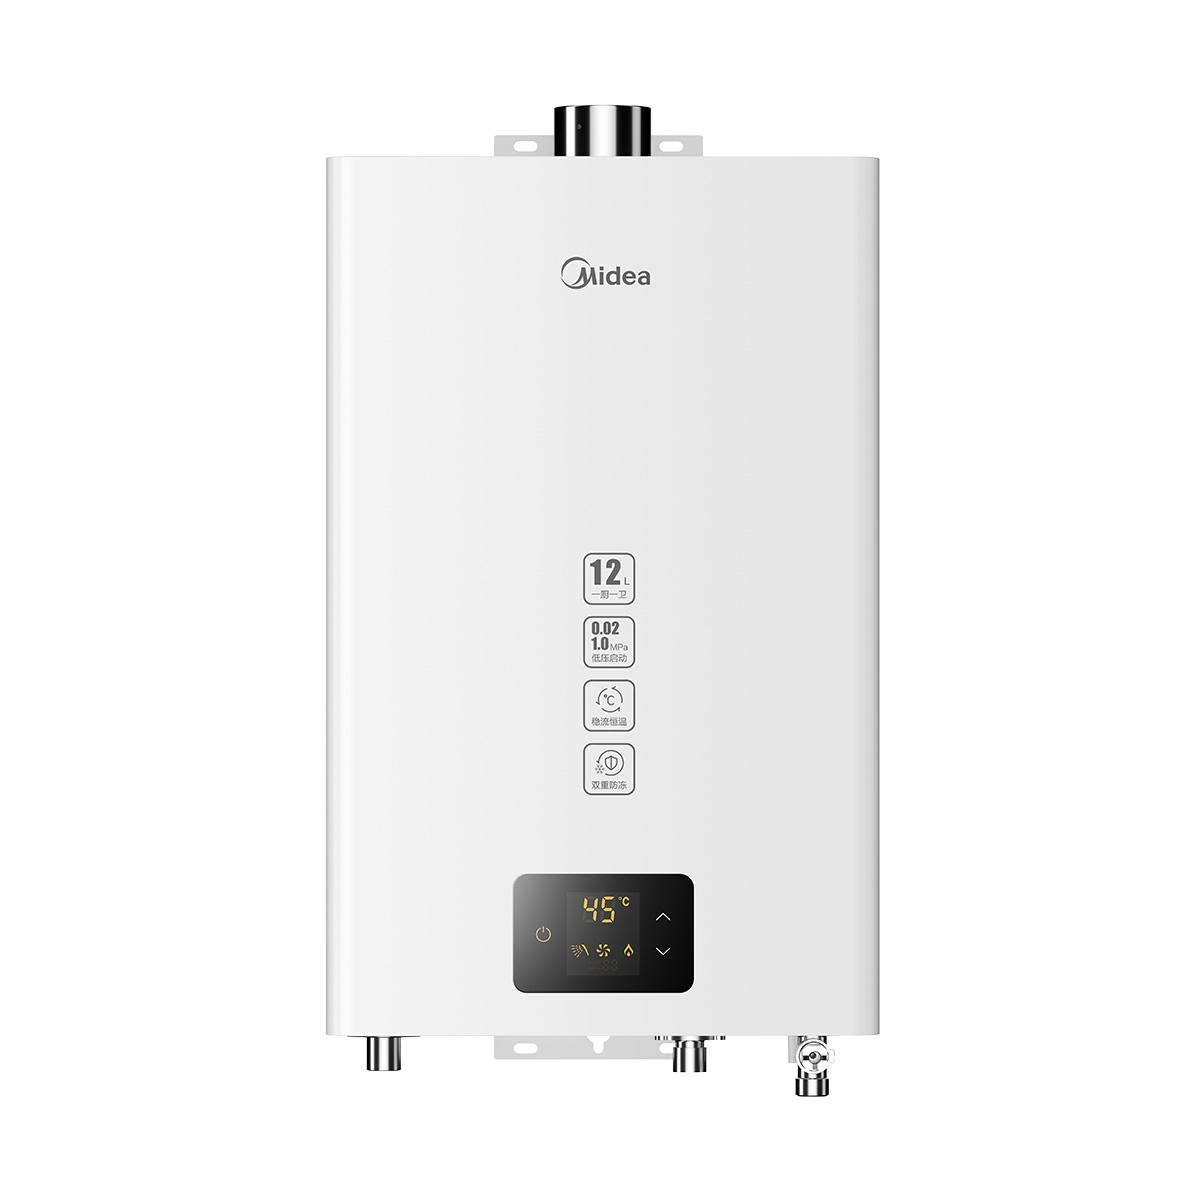 Midea/美的 JSQ22-12HM1燃气热水器 说明书.pdf